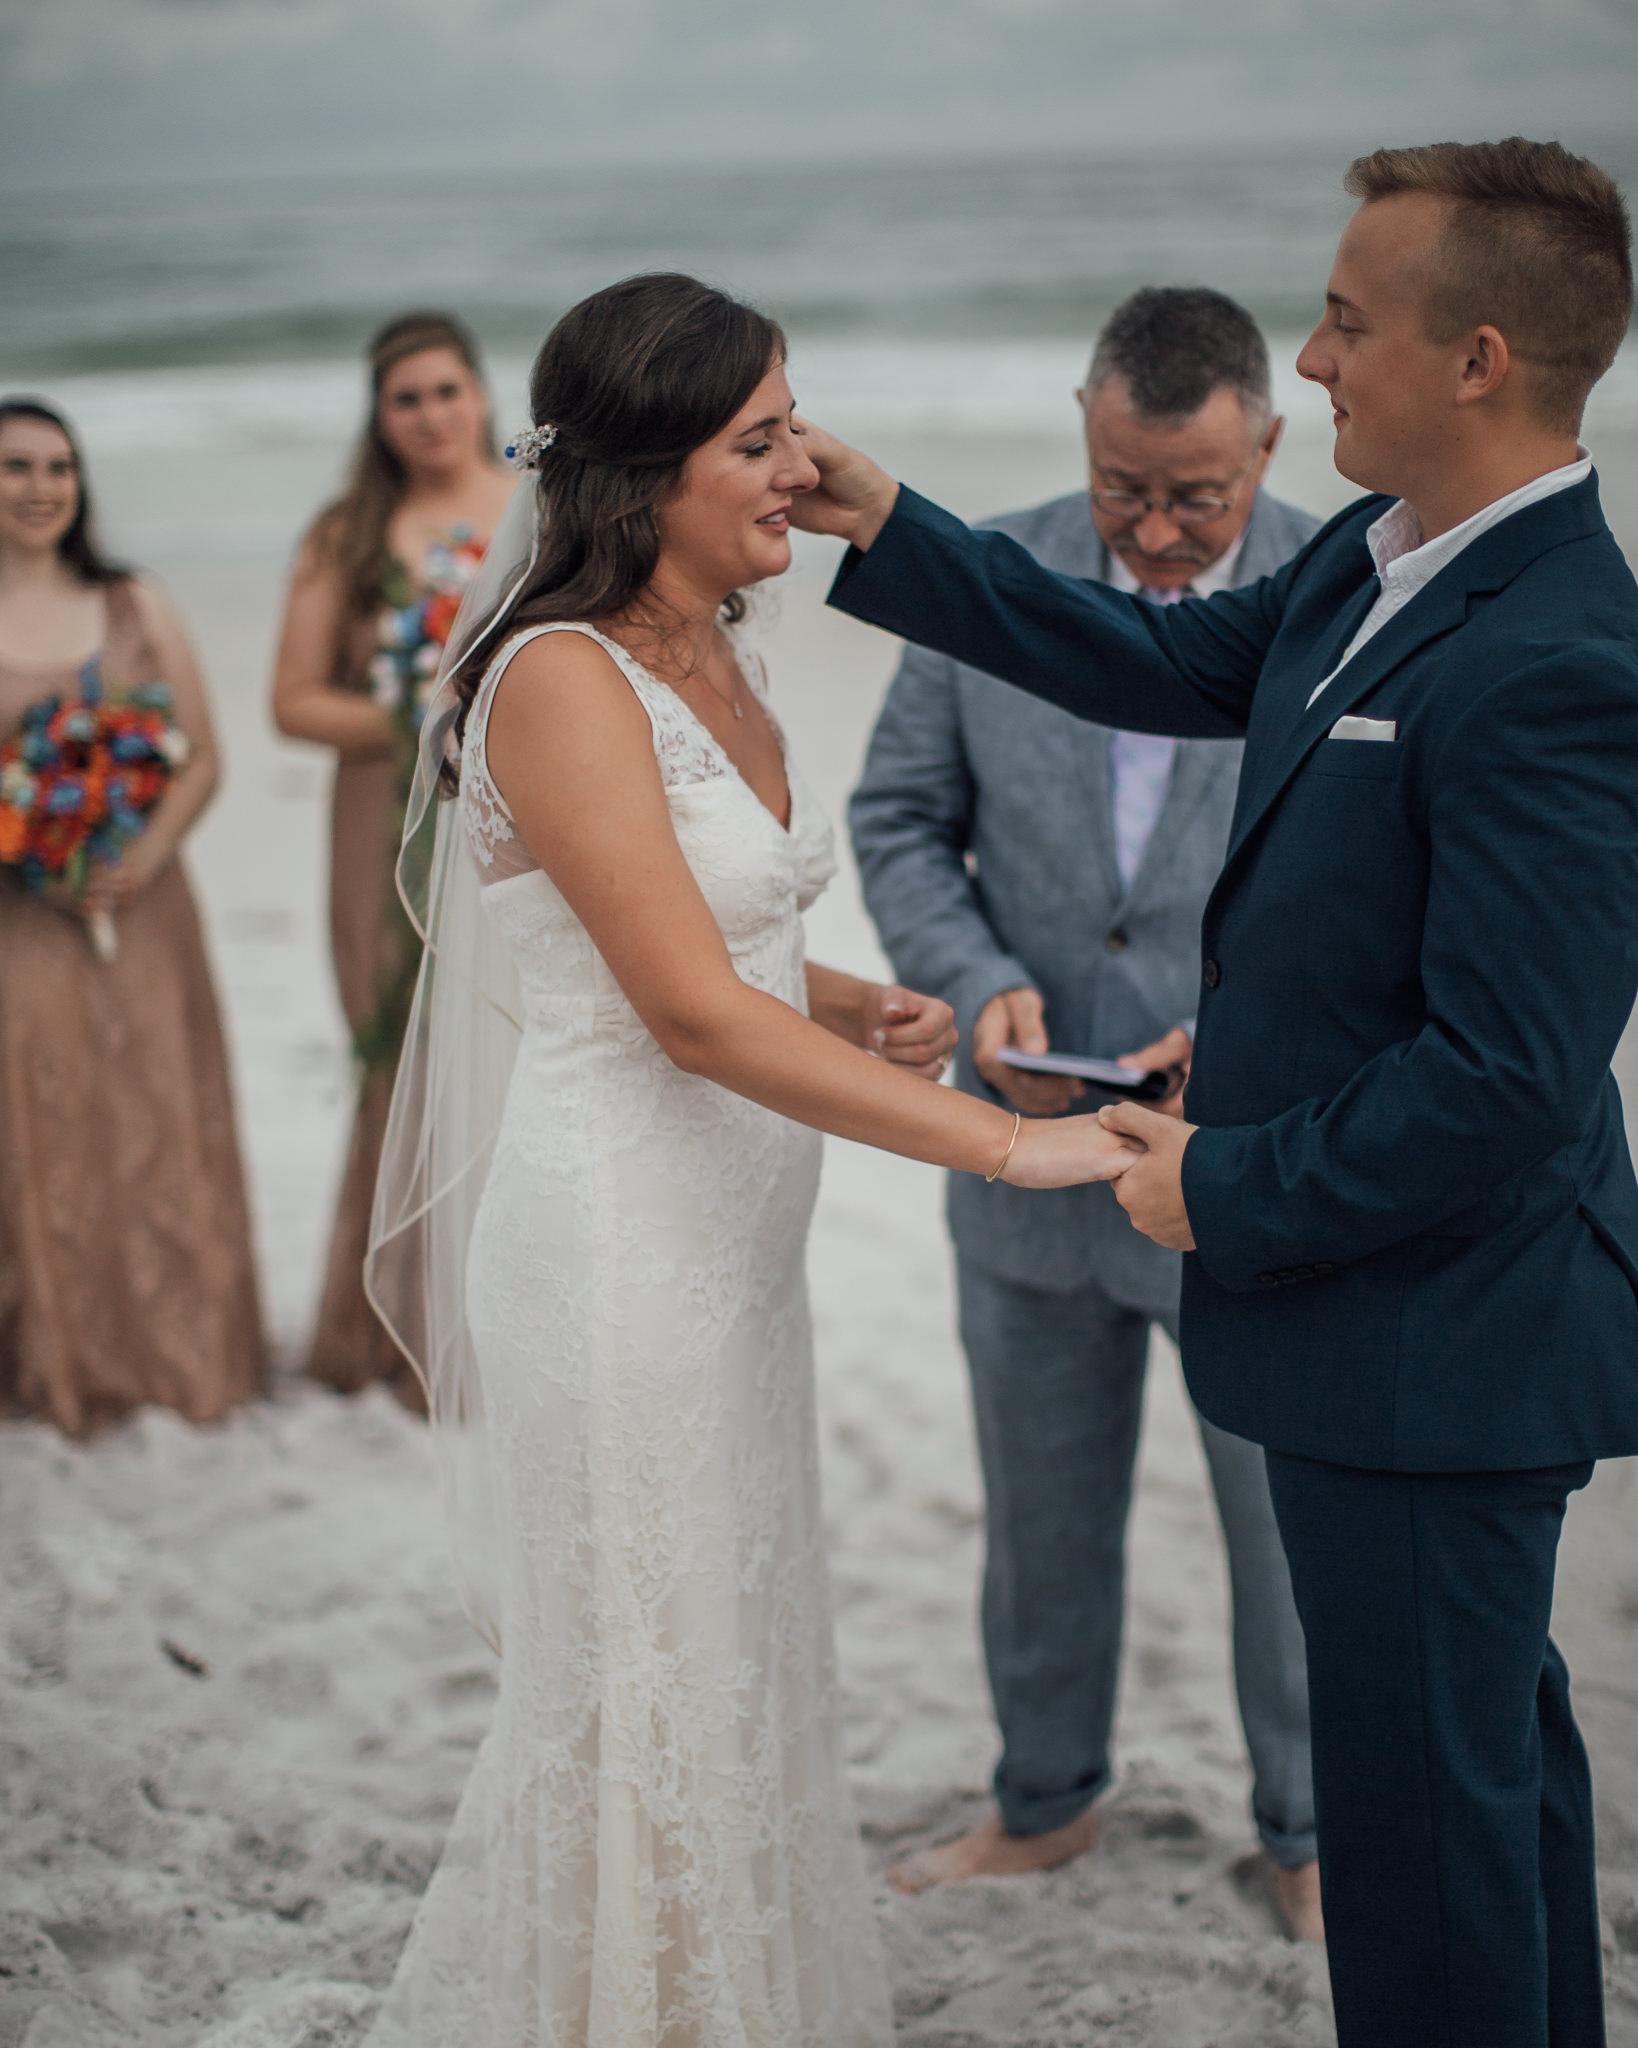 cassie-cook-photography-santa-rosa-beach-wedding-farrar-wedding-64.jpg